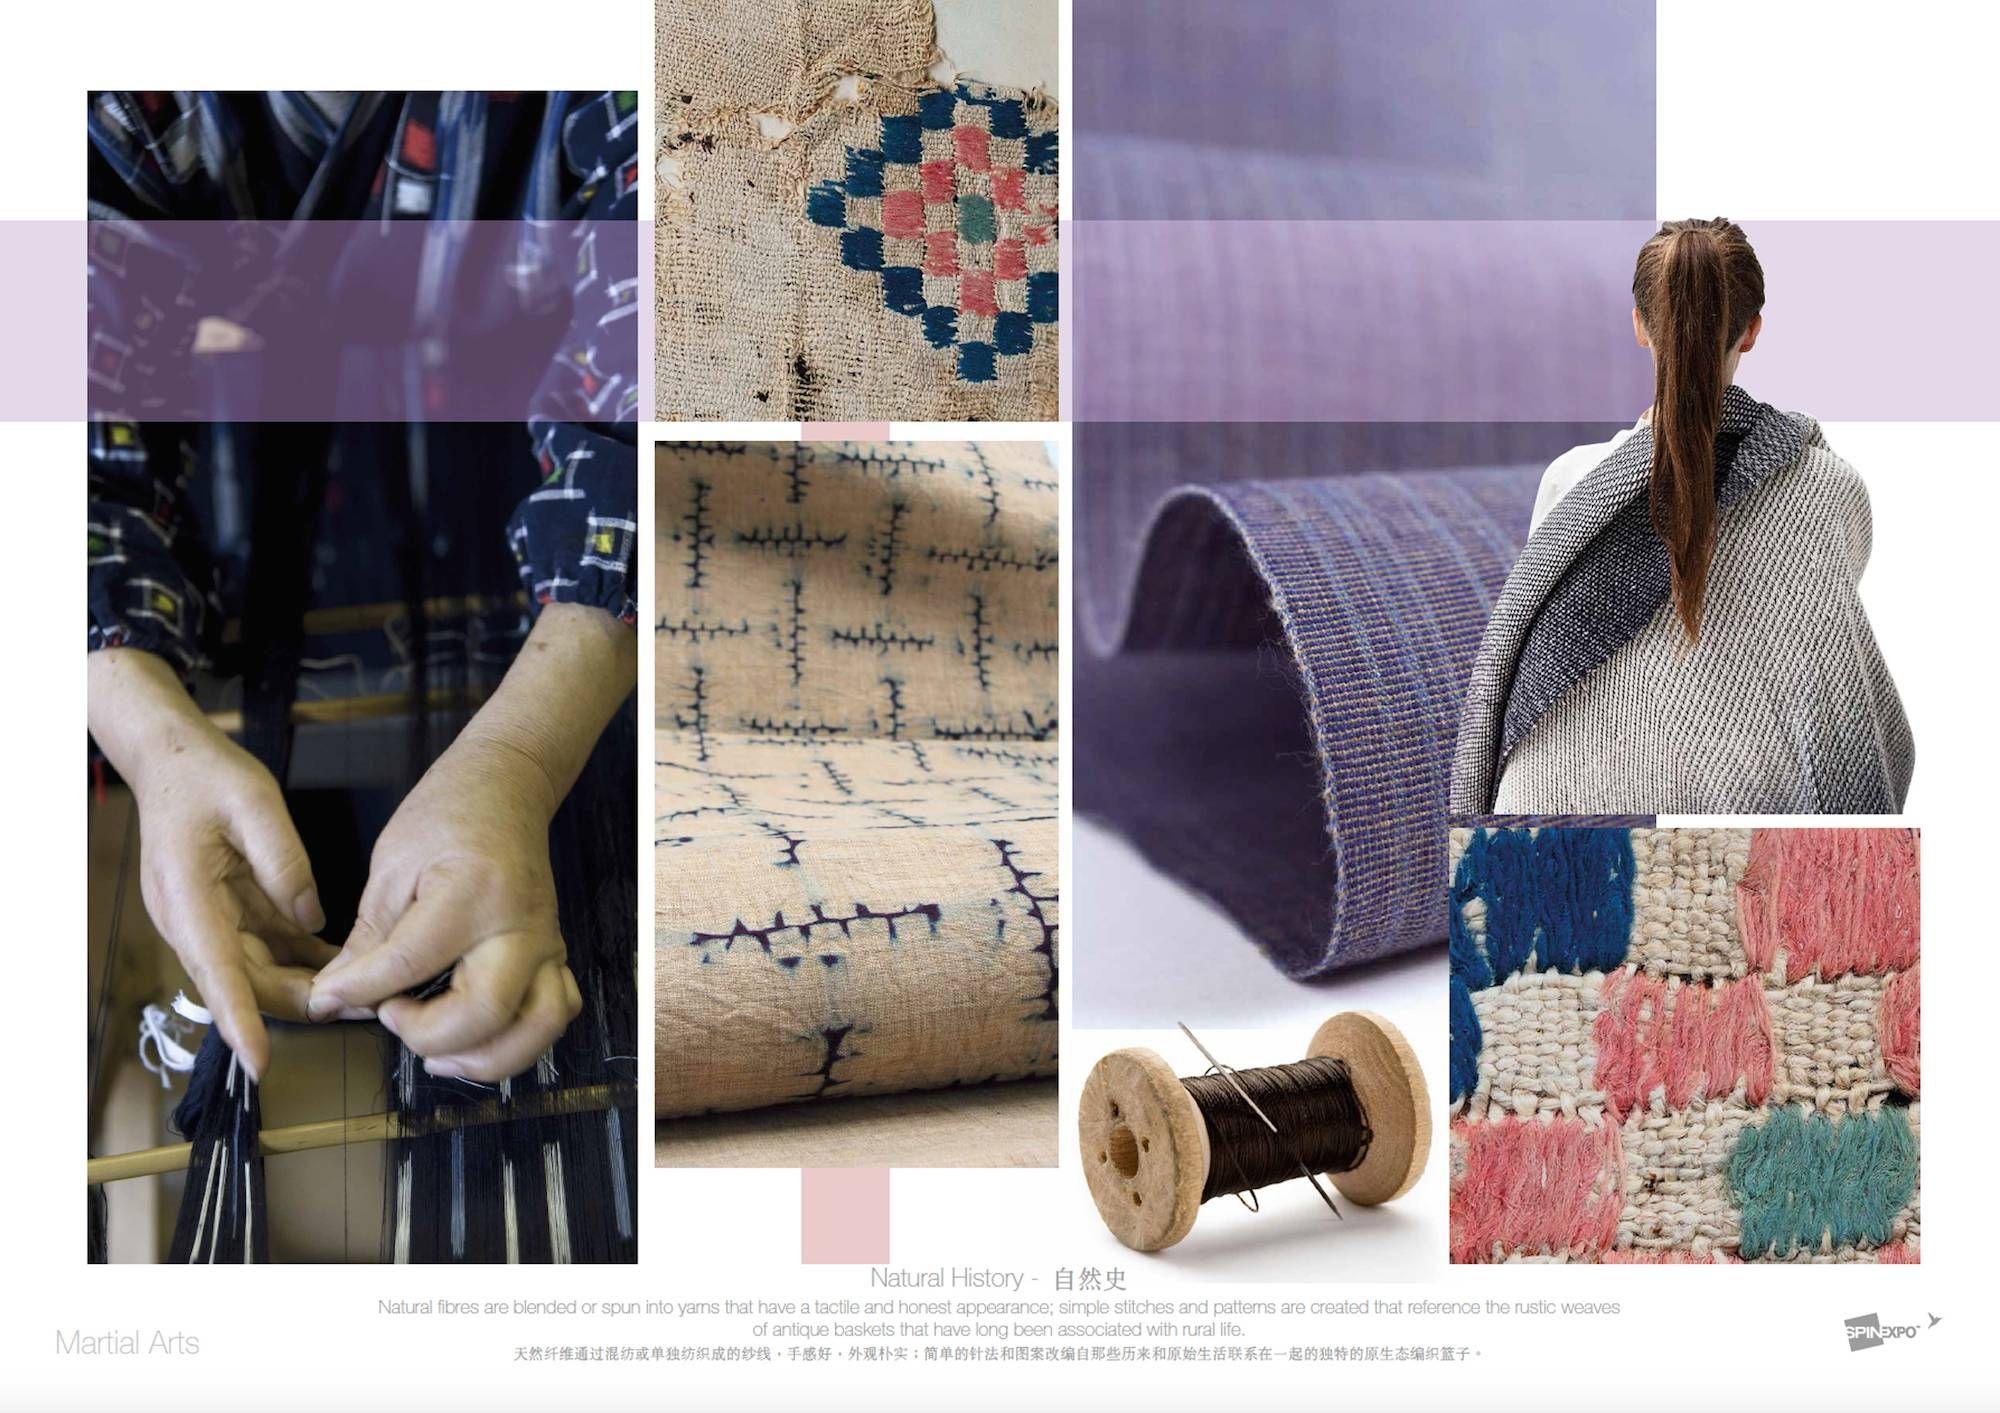 Martial Arts   SPINEXPLORE - Trend fashion knitwear